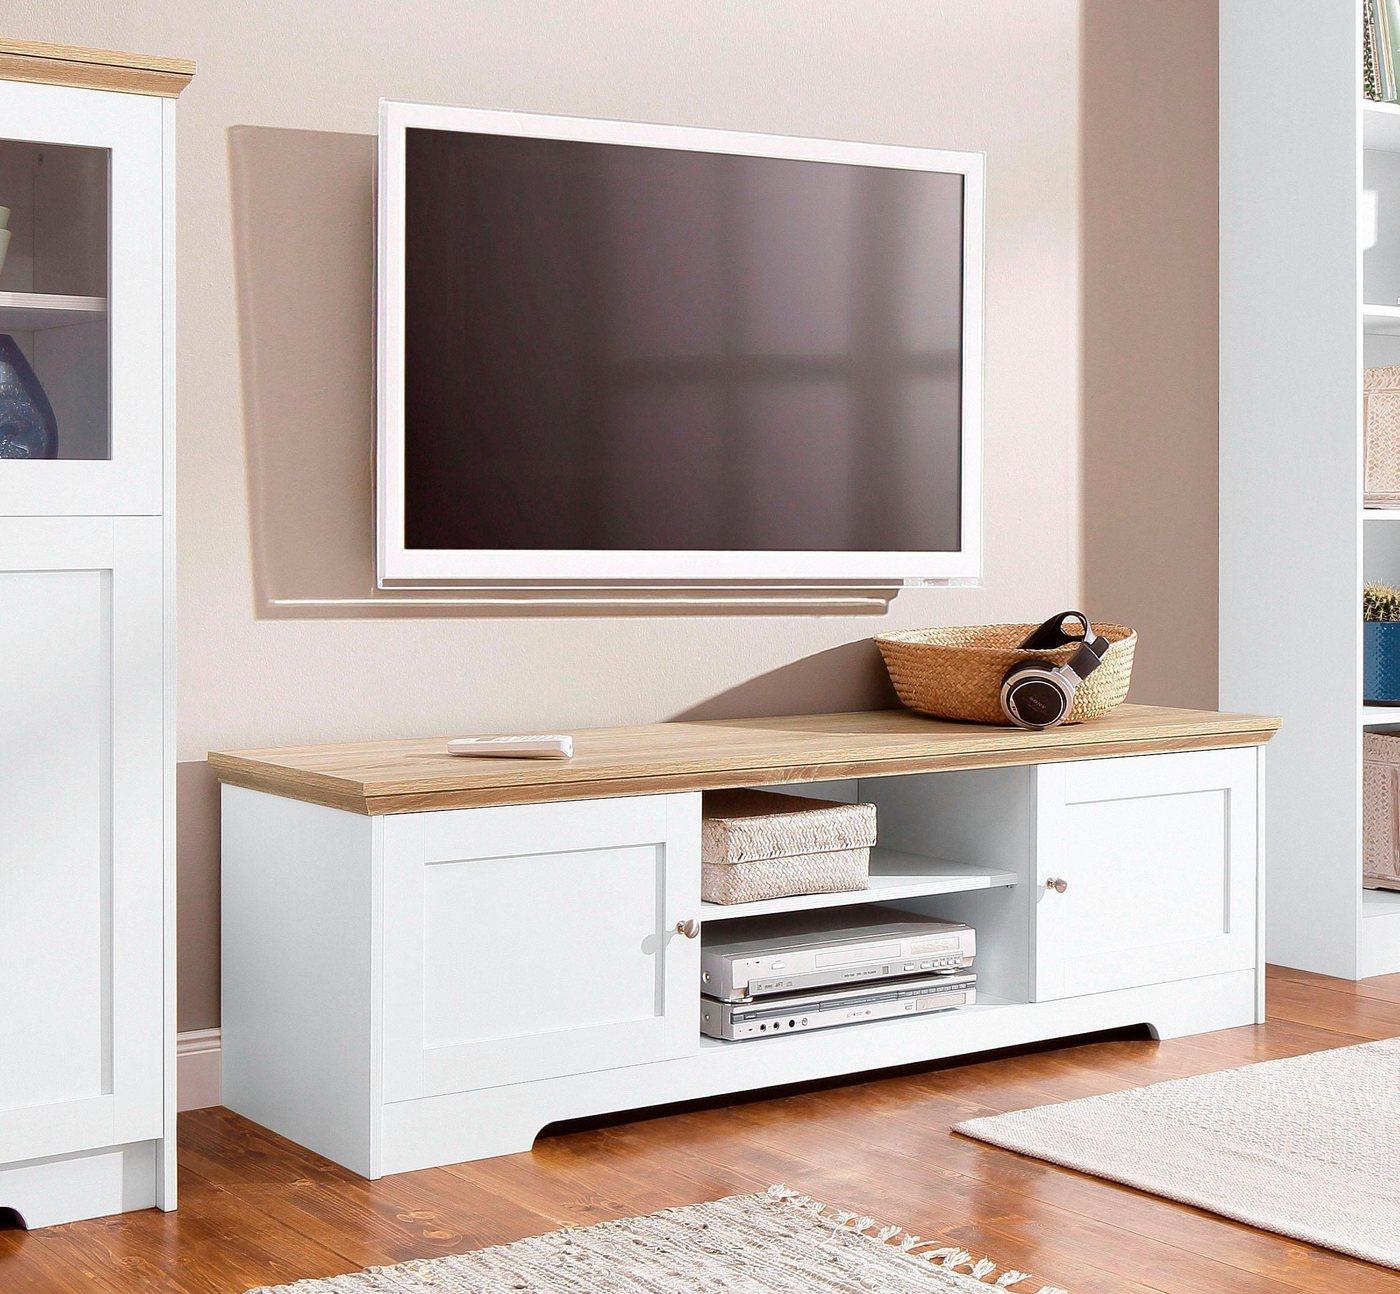 TV-meubel Nanna in 2 afmetingen